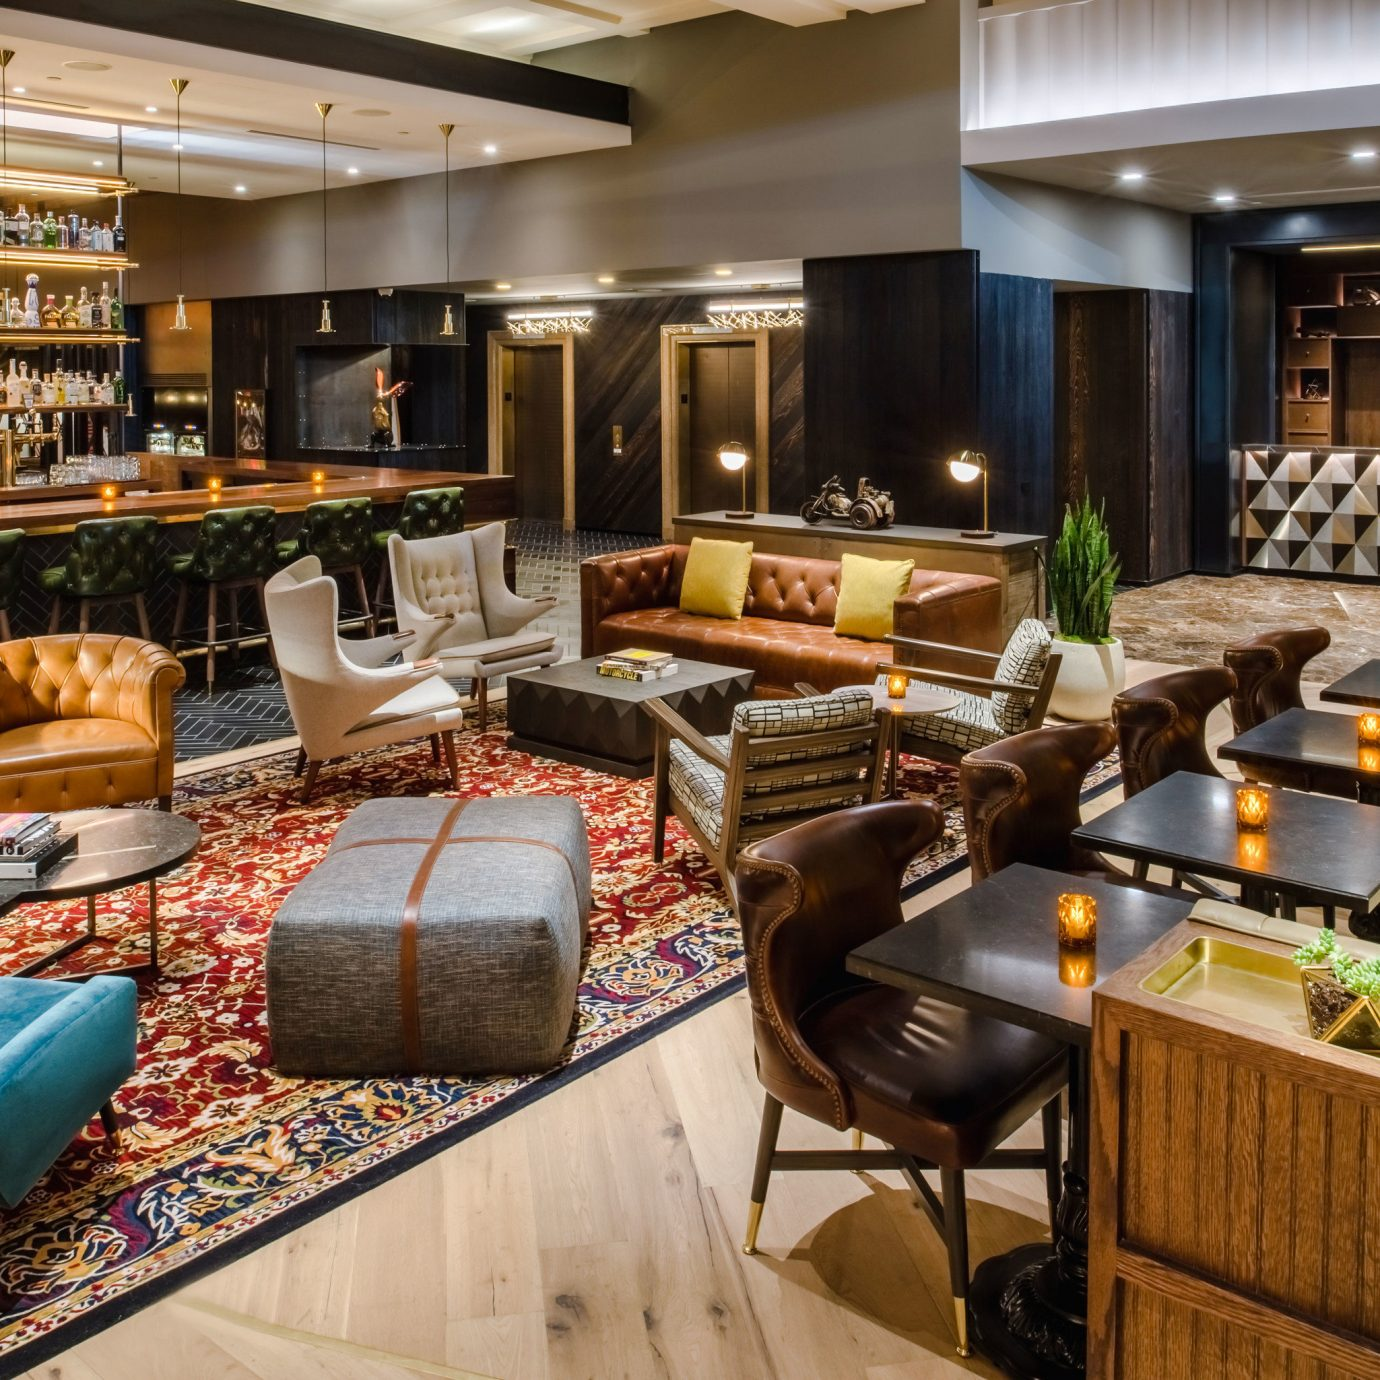 Boutique Hotels Hotels Luxury Travel table indoor ceiling Lobby interior design restaurant furniture